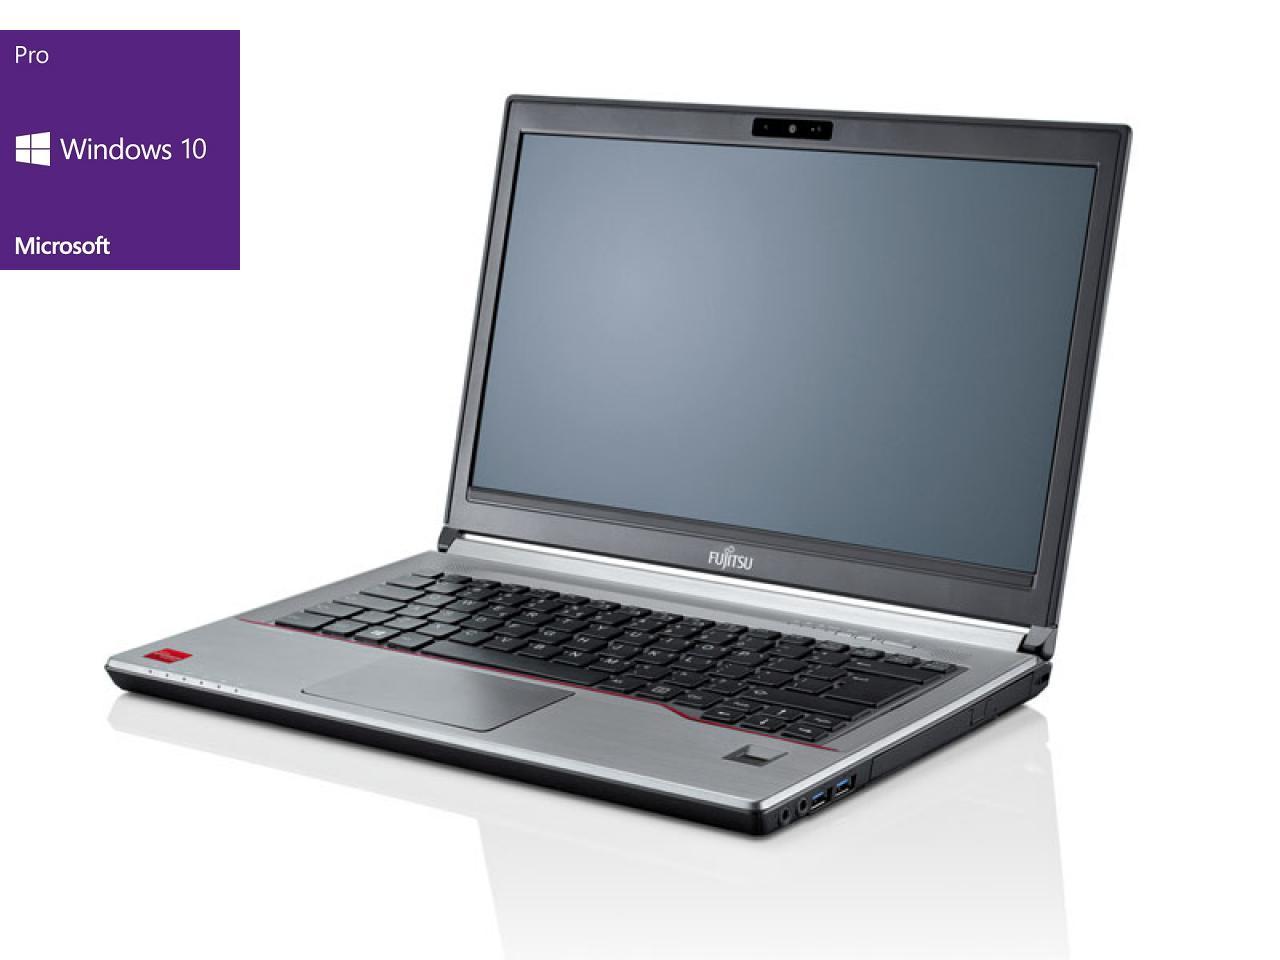 Fujitsu  LIFEBOOK E744  - shop.bb-net.de